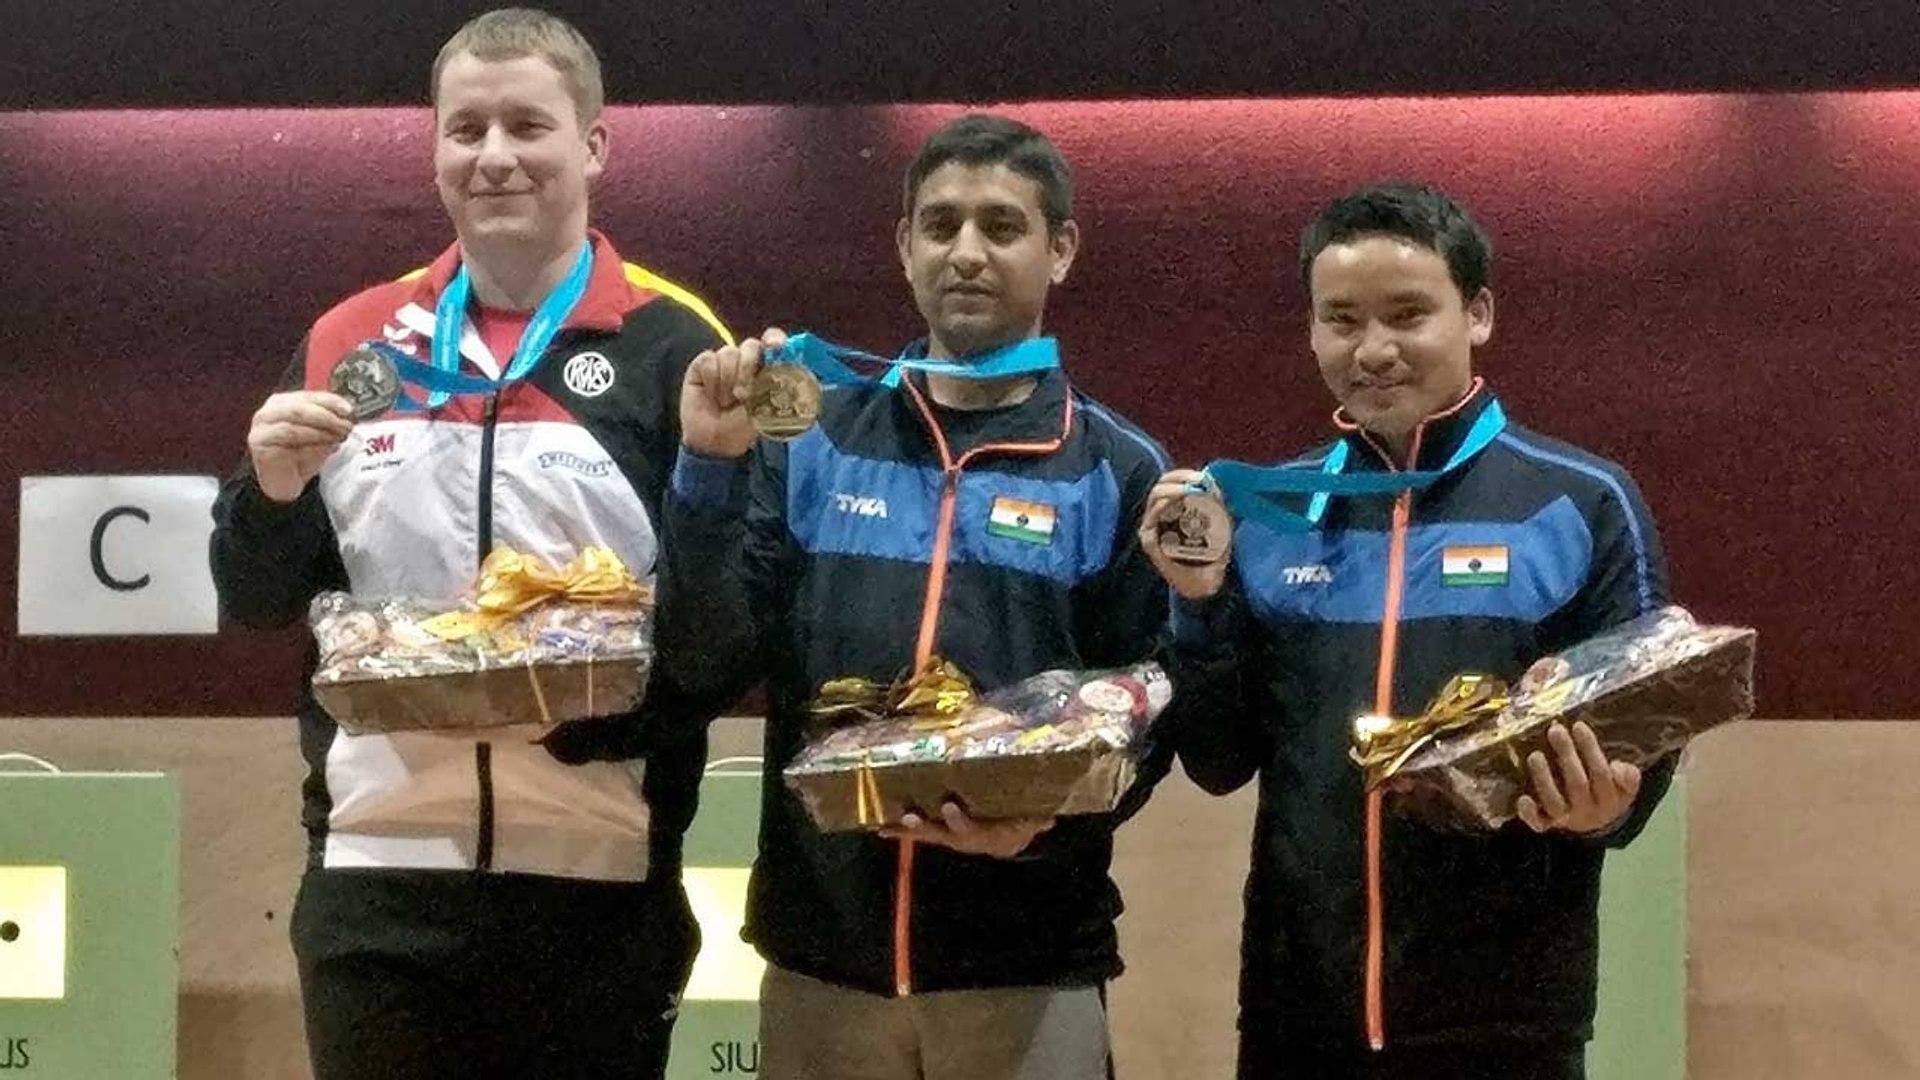 CWG 2018 : Jitu Rai and Om Prakash Mitharwal bags gold and bronze medals in shooting | Oneindia News